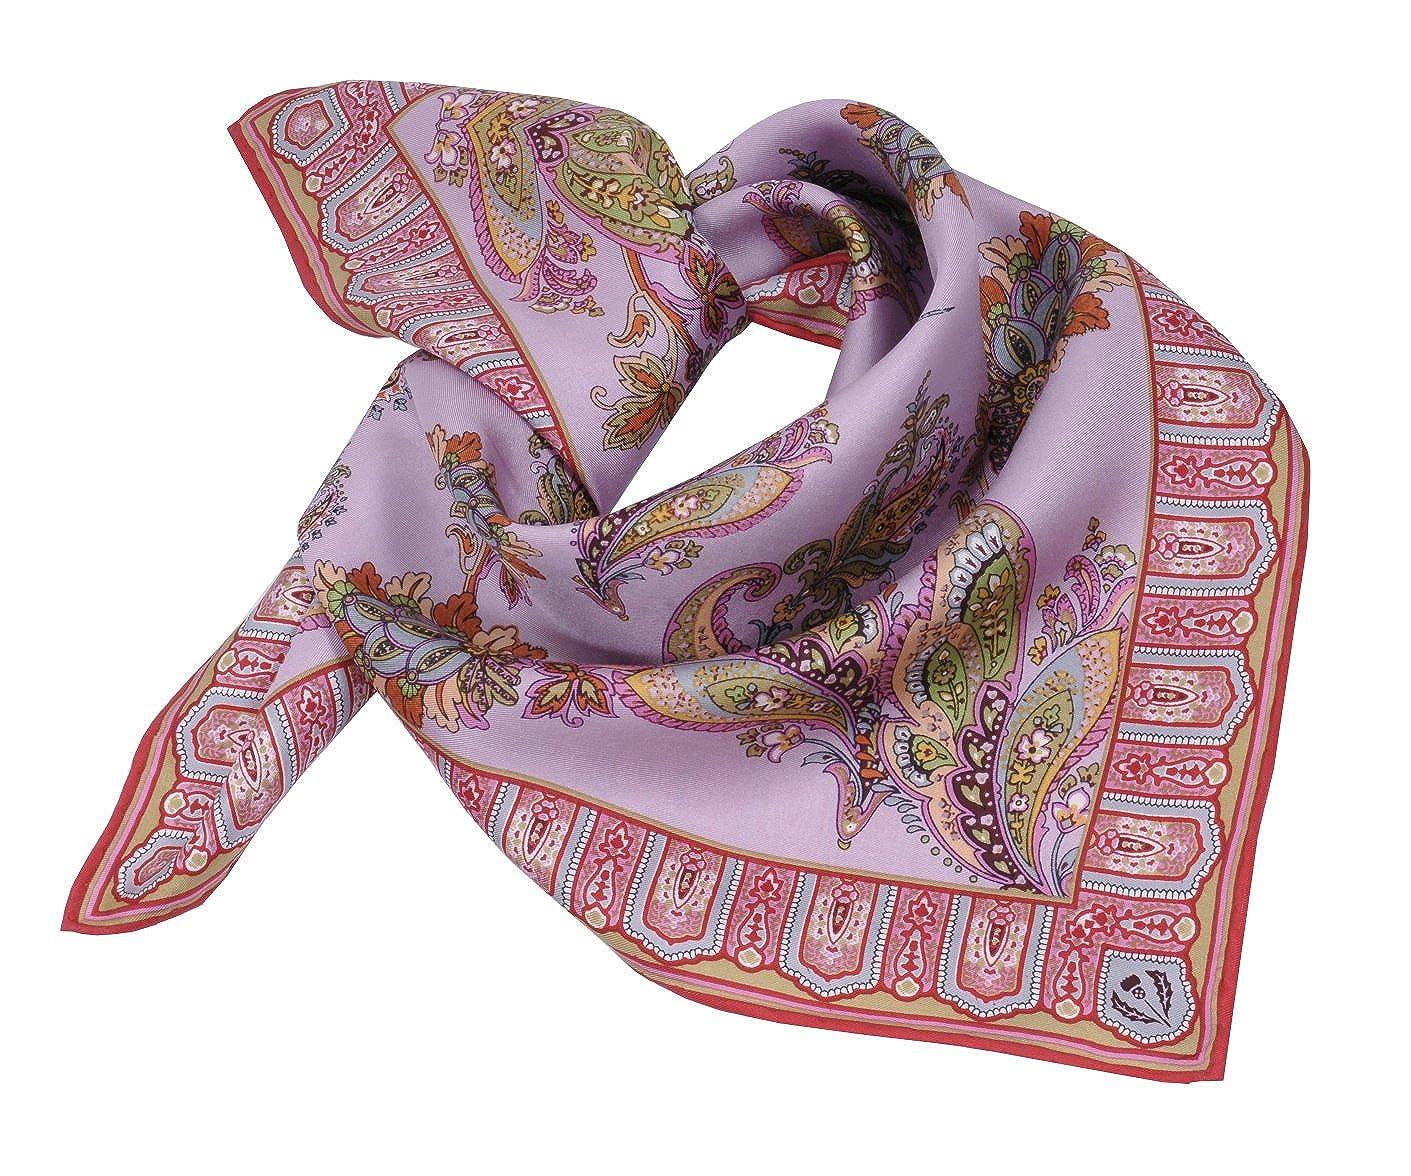 Moschen-Bayern Damen Trachtenhalstuch Halstuch Seide Rosa Pink